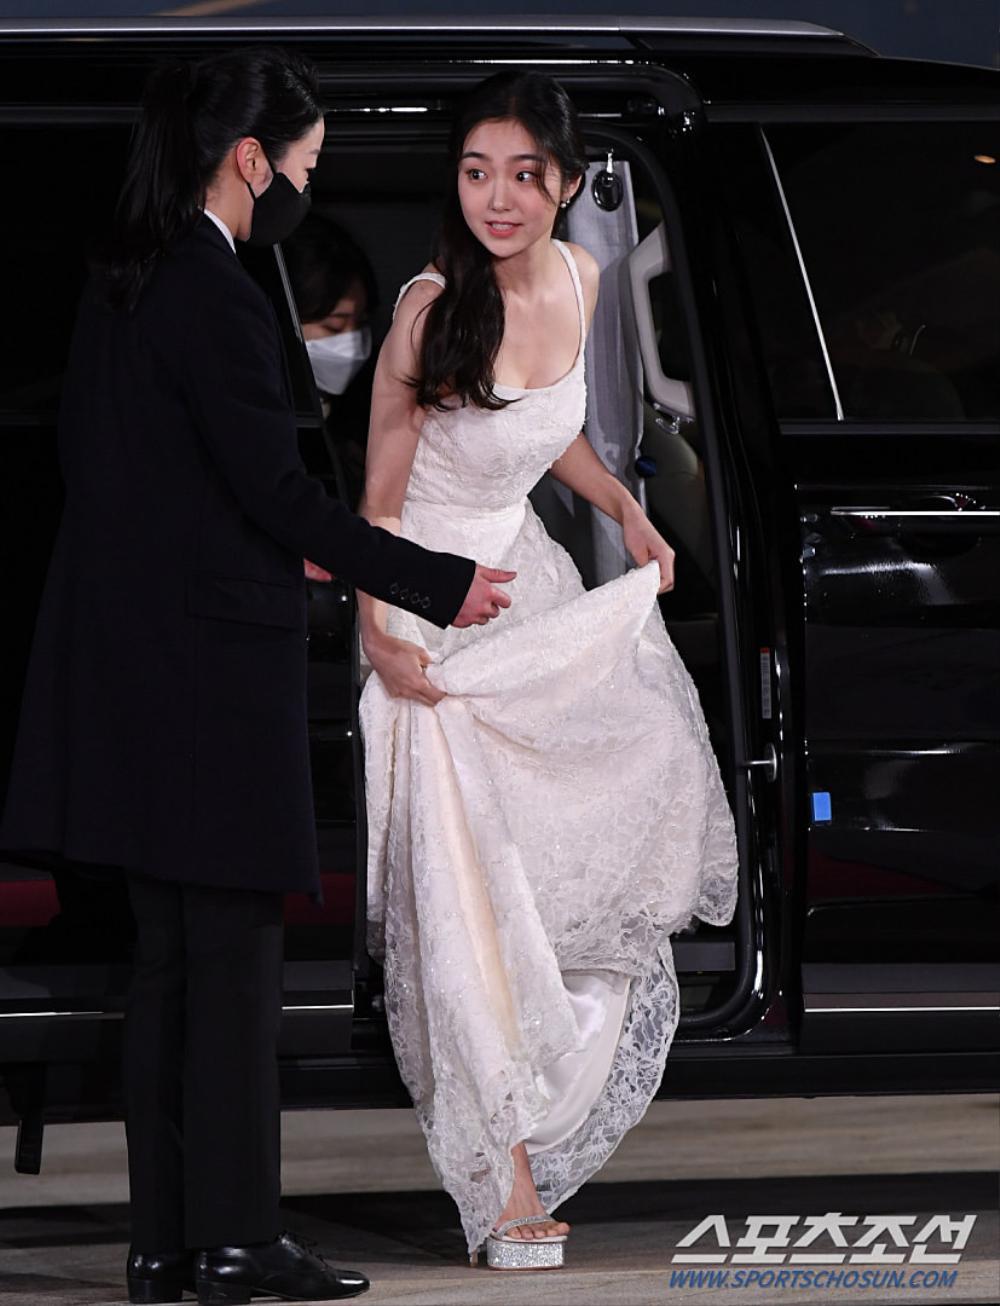 Thảm đỏ 'Rồng xanh 2020': Shin Hye Sun 'cân sắc' Shin Min Ah, Jung Woo Sung - Lee Byung Hun điển trai! Ảnh 33